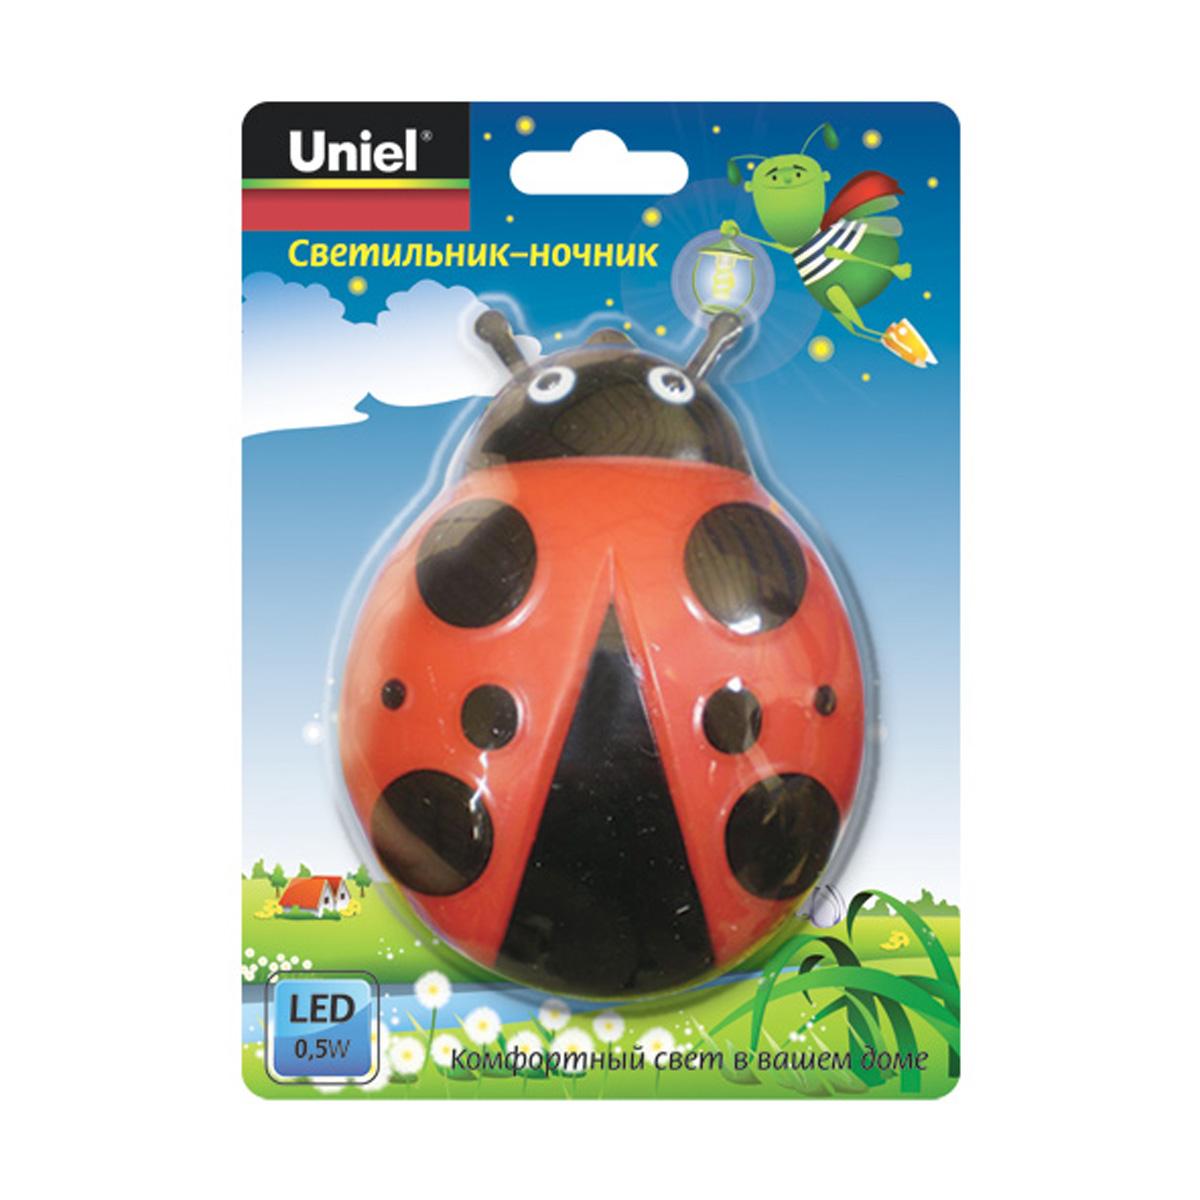 Ночник Uniel Dtl-301-Жук/red/3led/0,5w